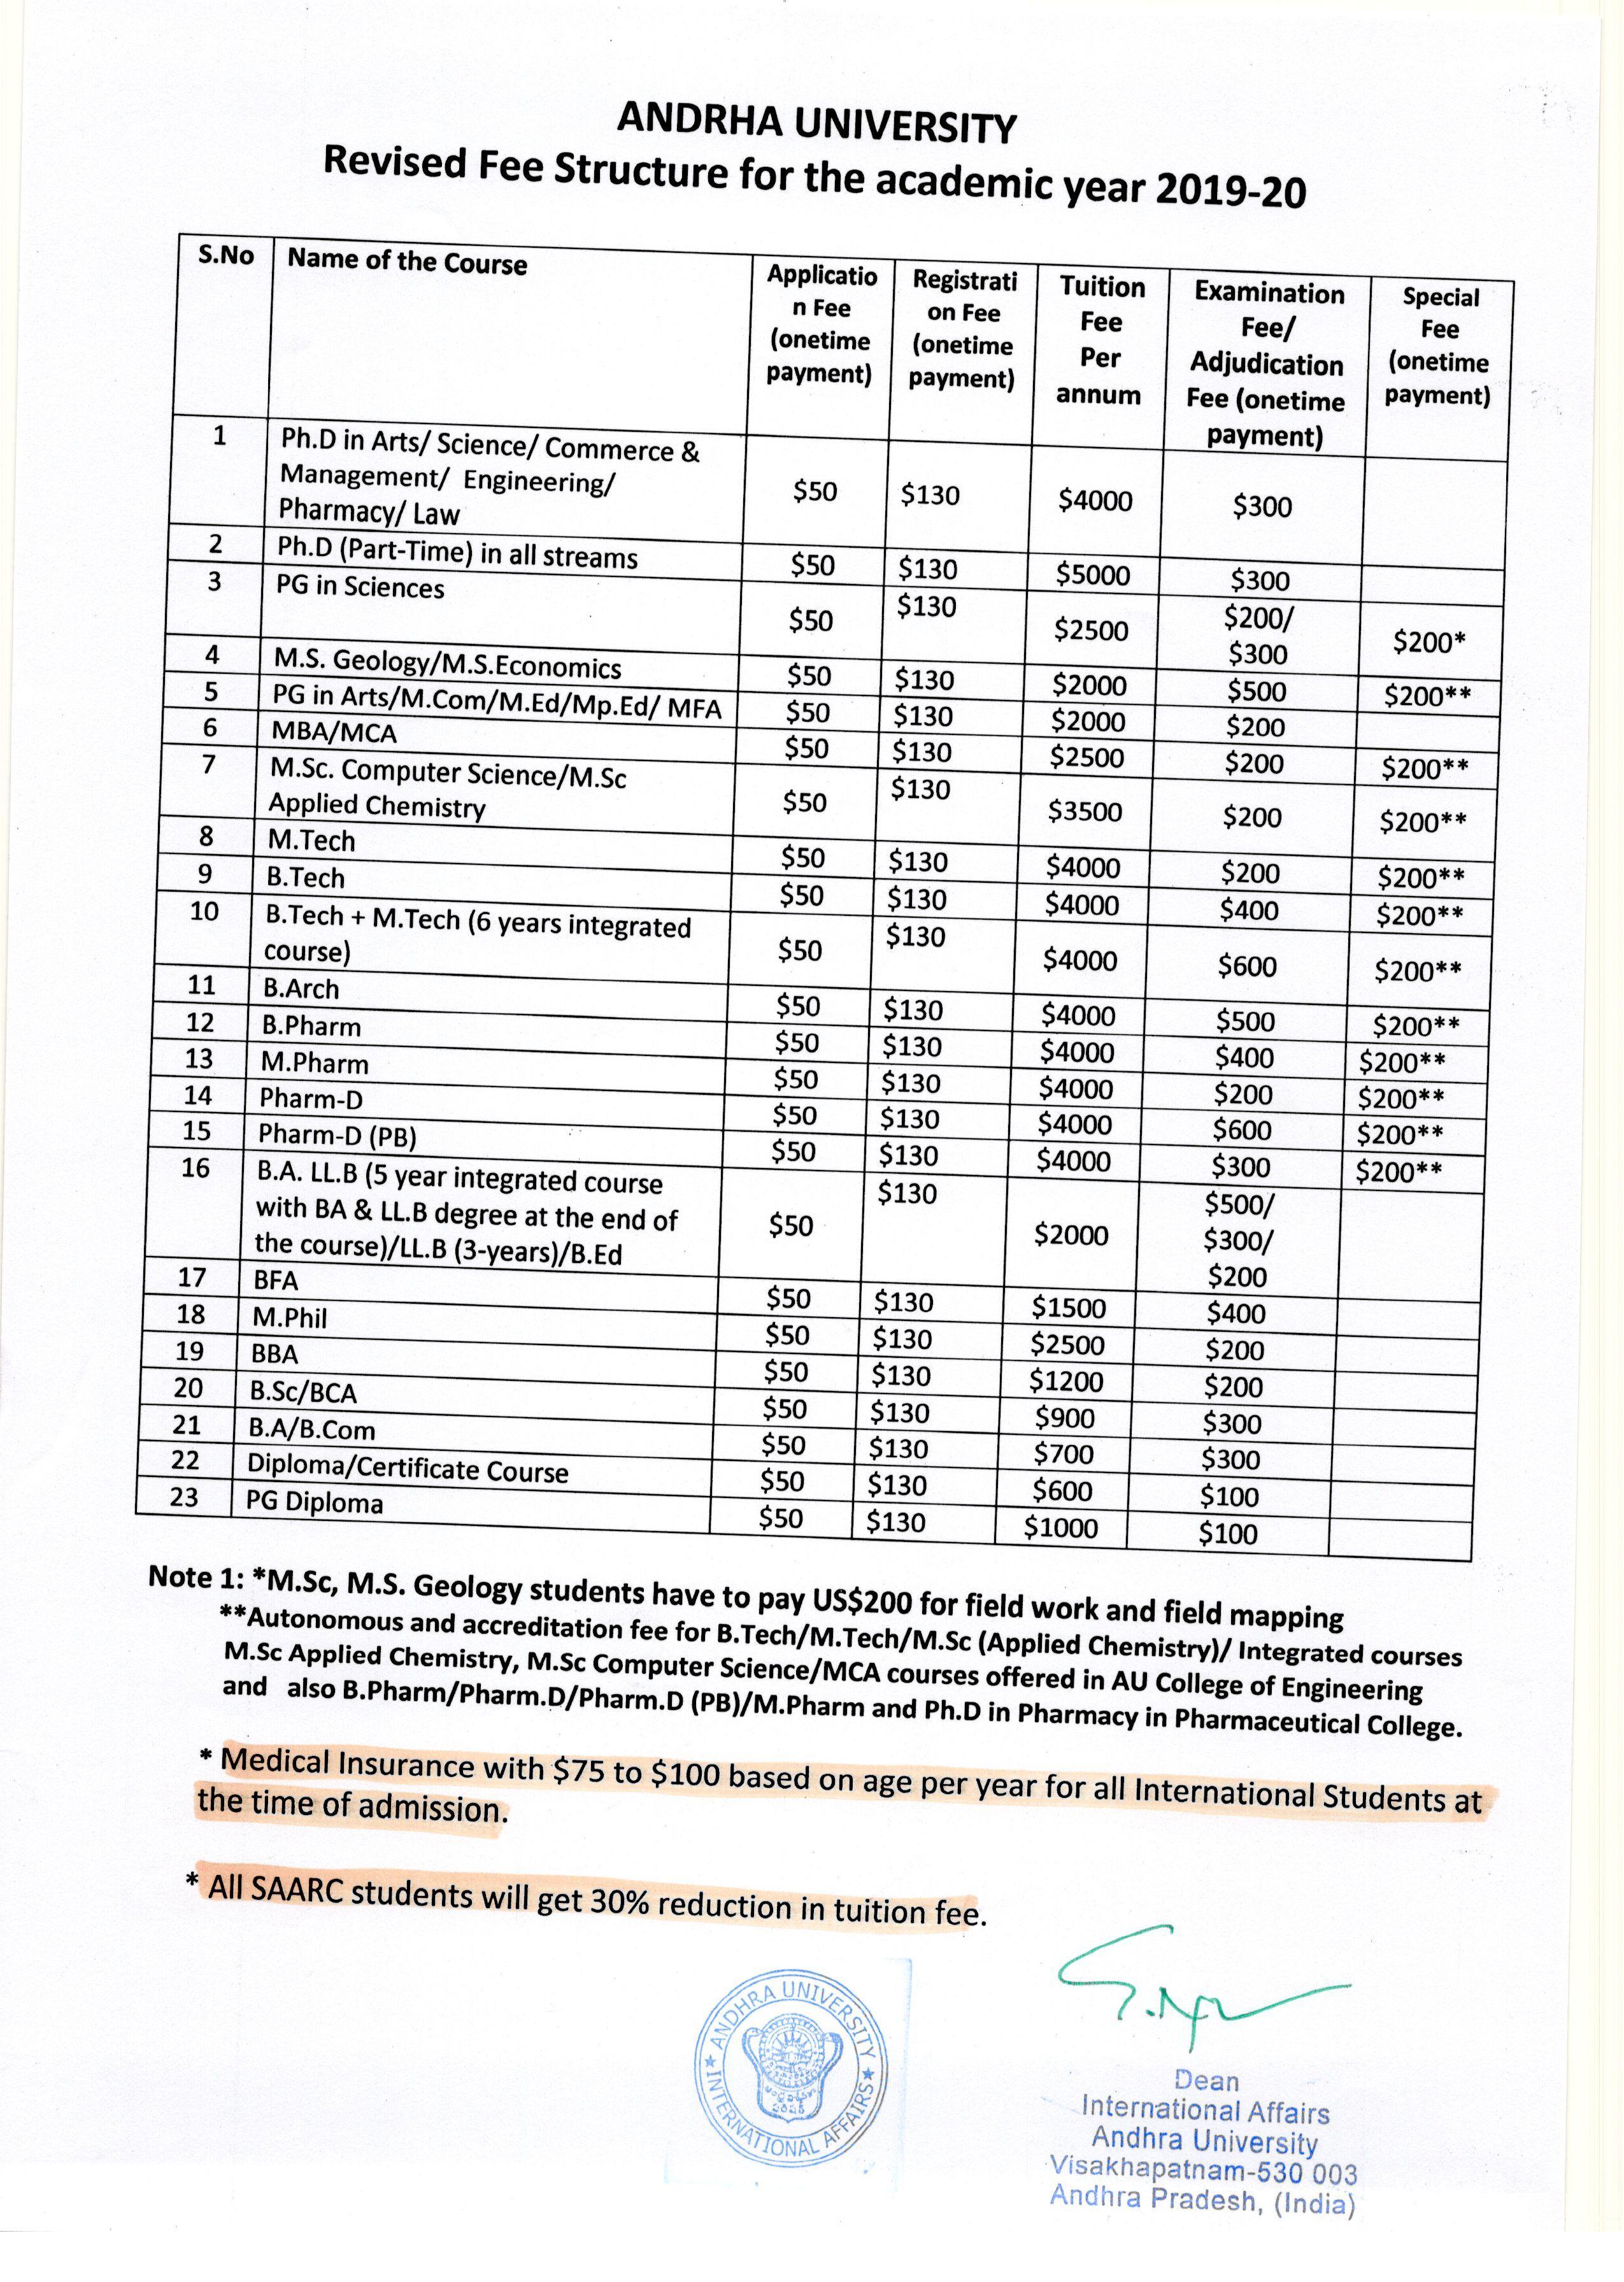 Andhra University | International Affairs